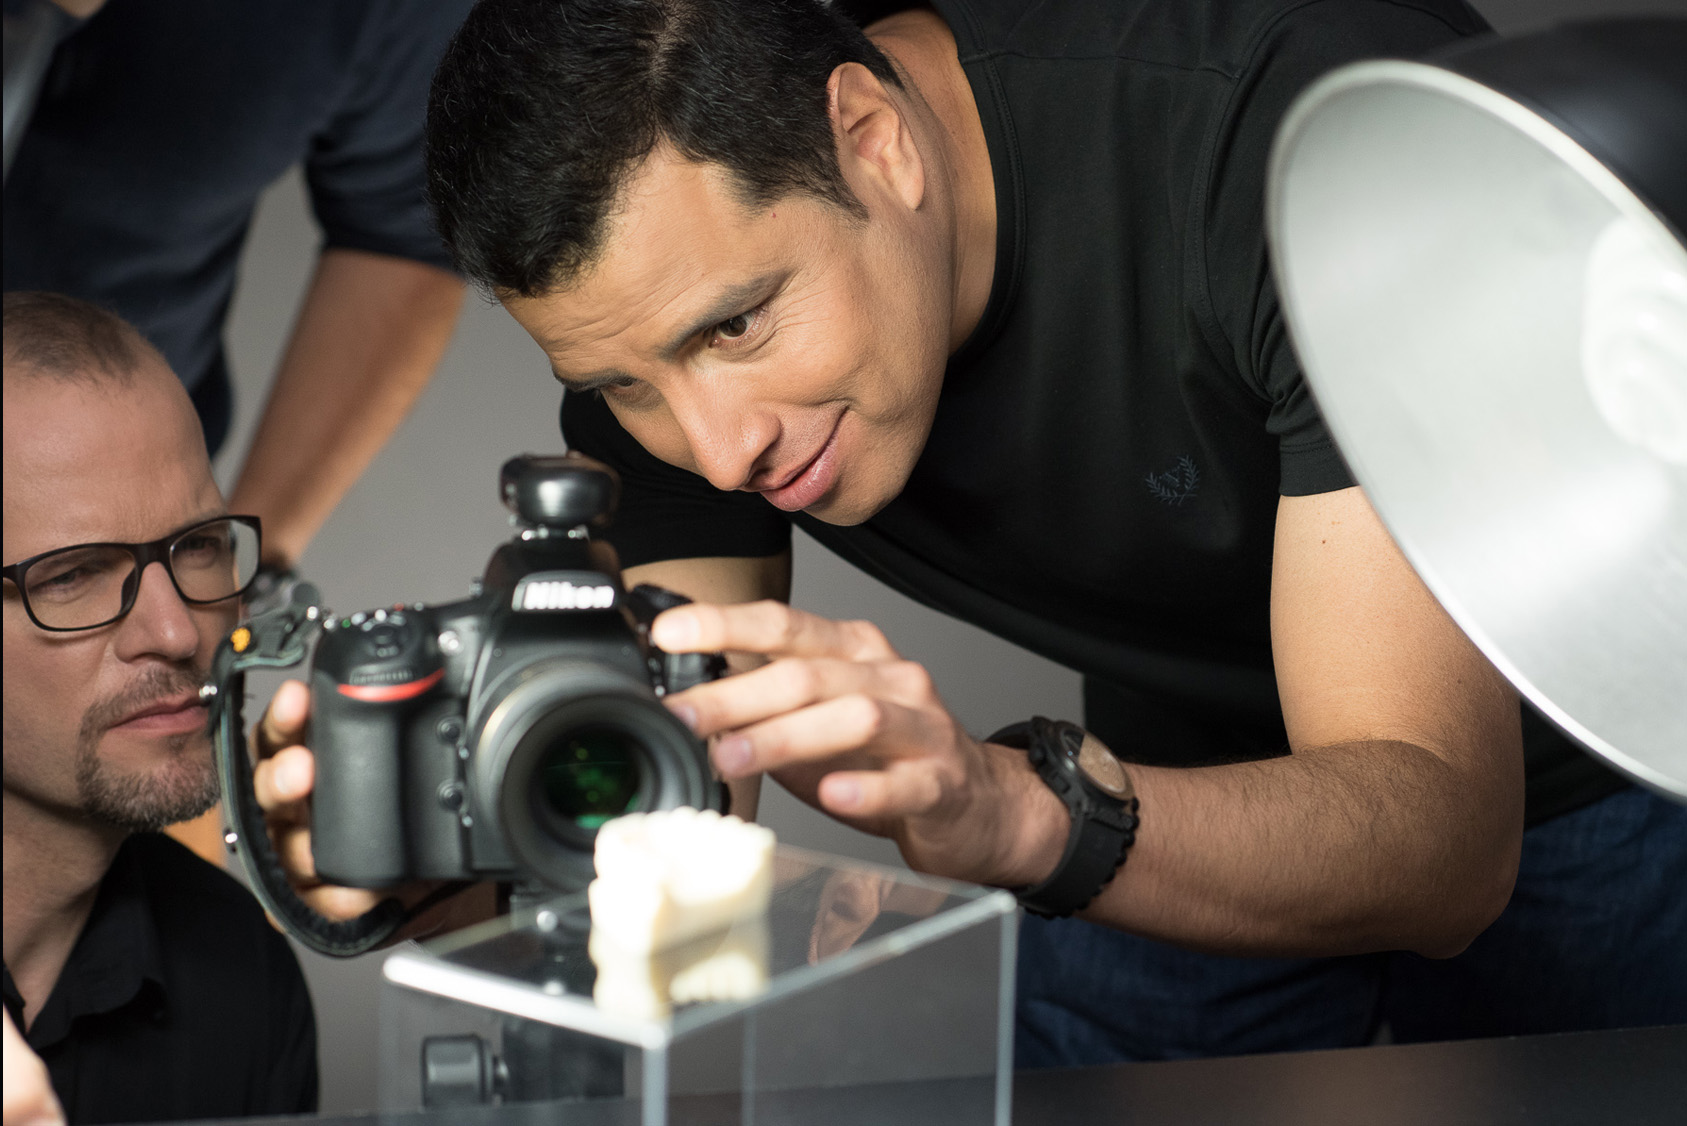 Lab Work Photography Carlos Ayala